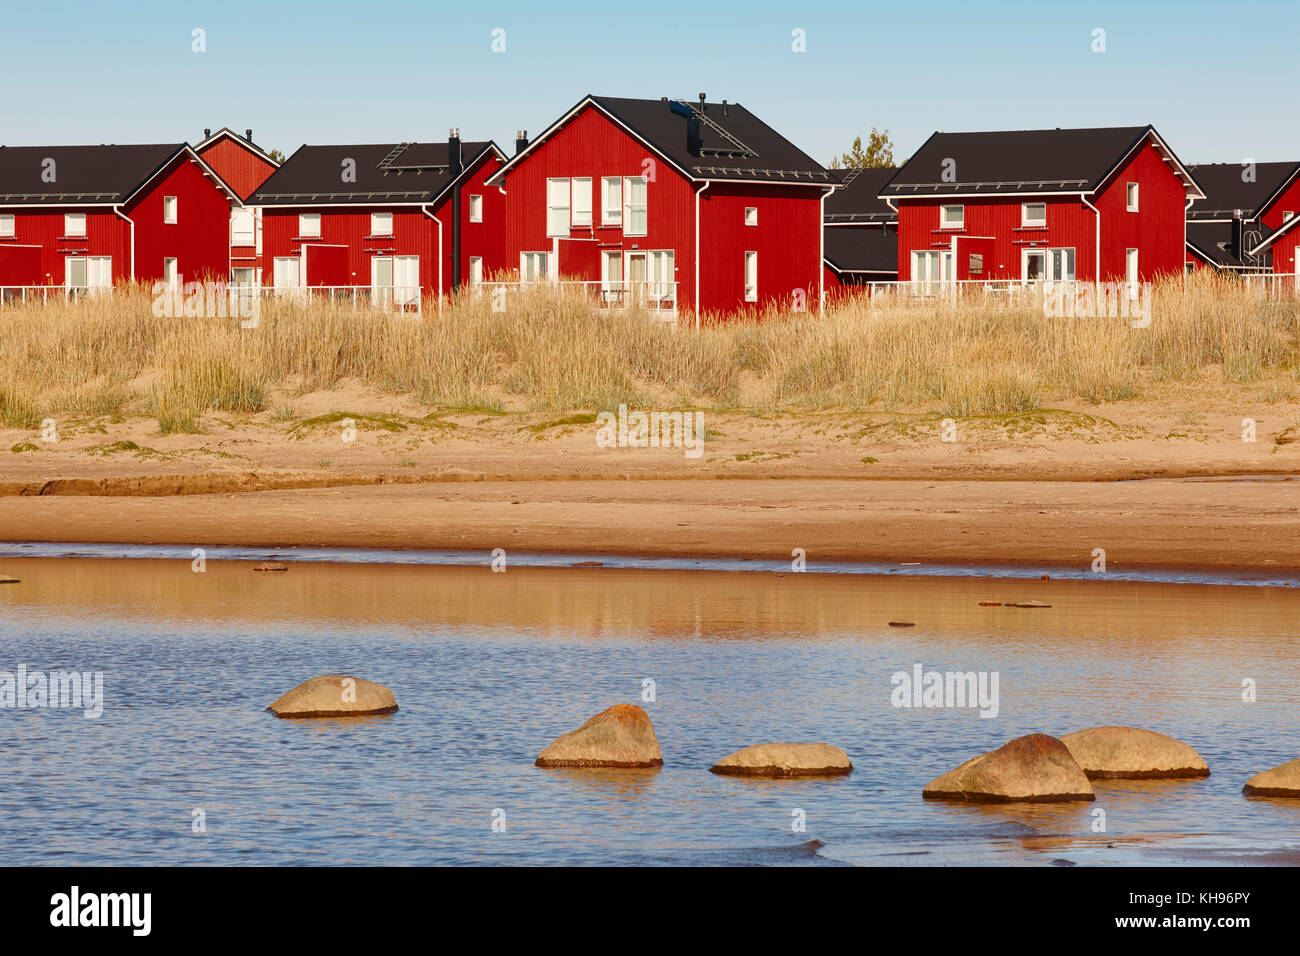 Red wooden houses near Marjaniemi beach, Hailuoto island. Finland. Travel - Stock Image